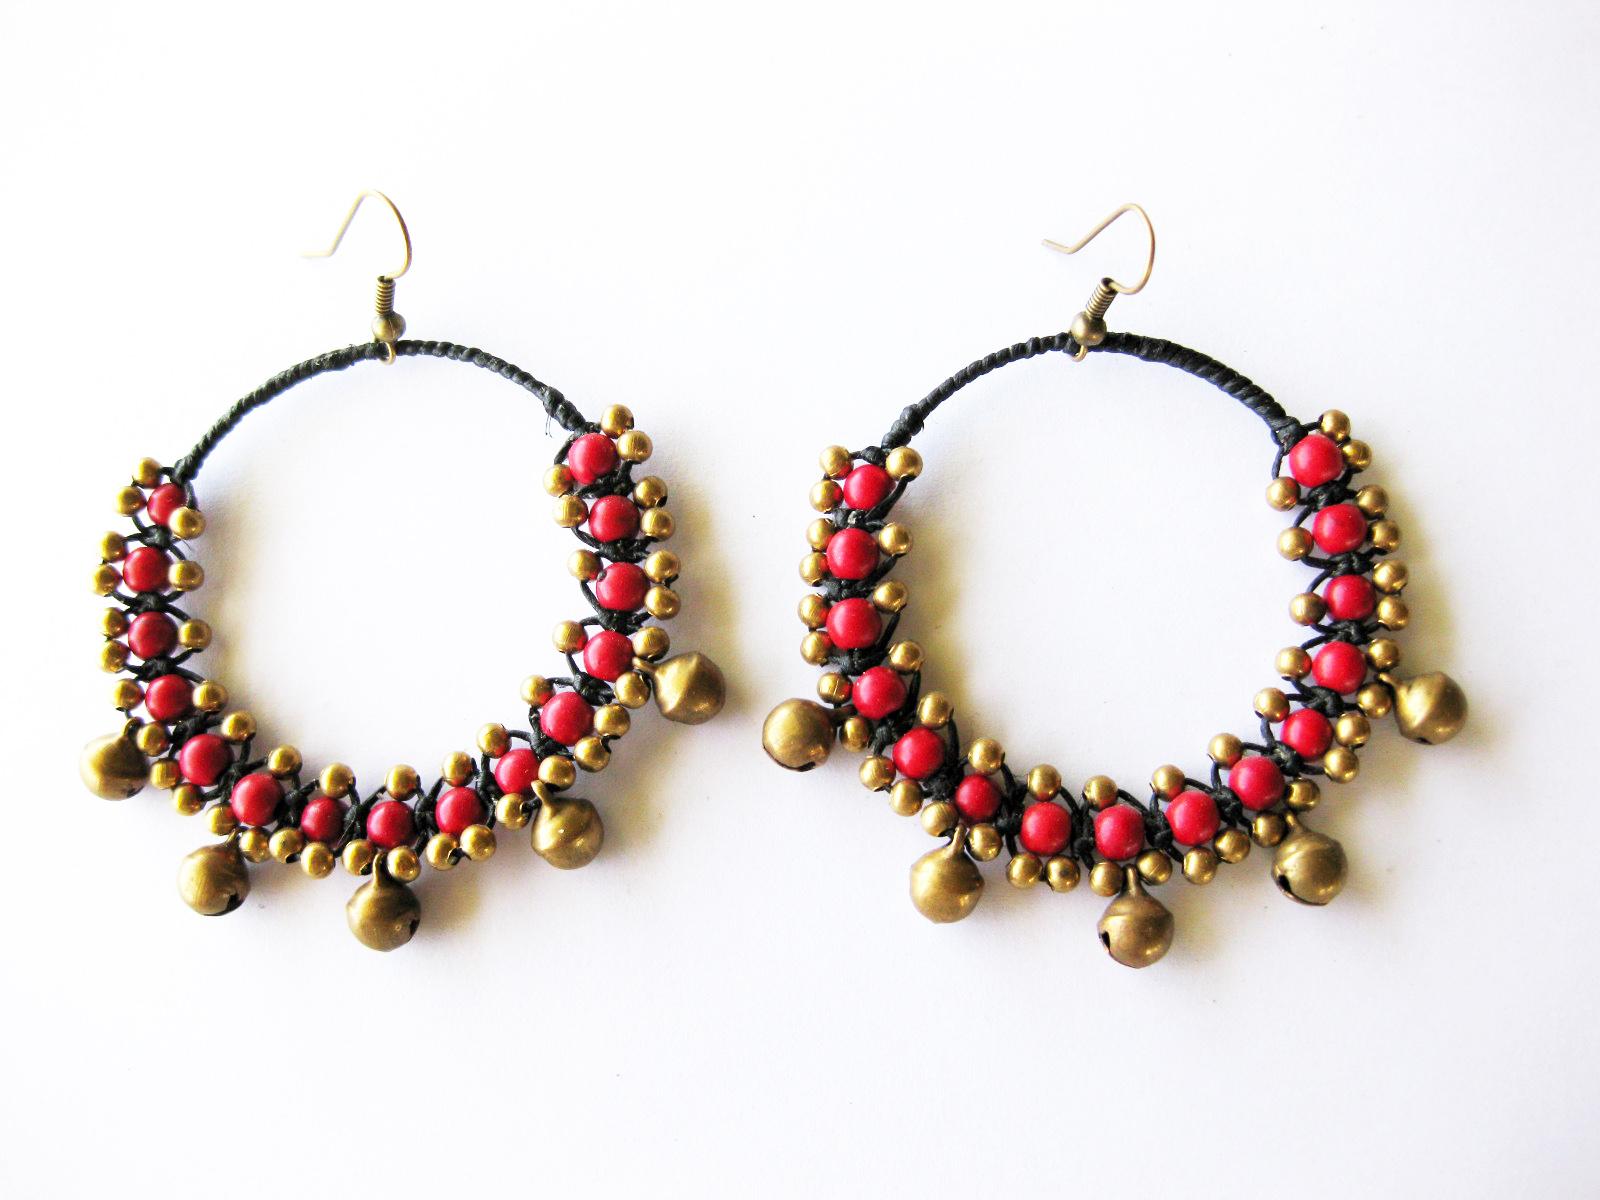 Boho Earrings Jingle Bells with Red bead stone Handmade Jewelry ...